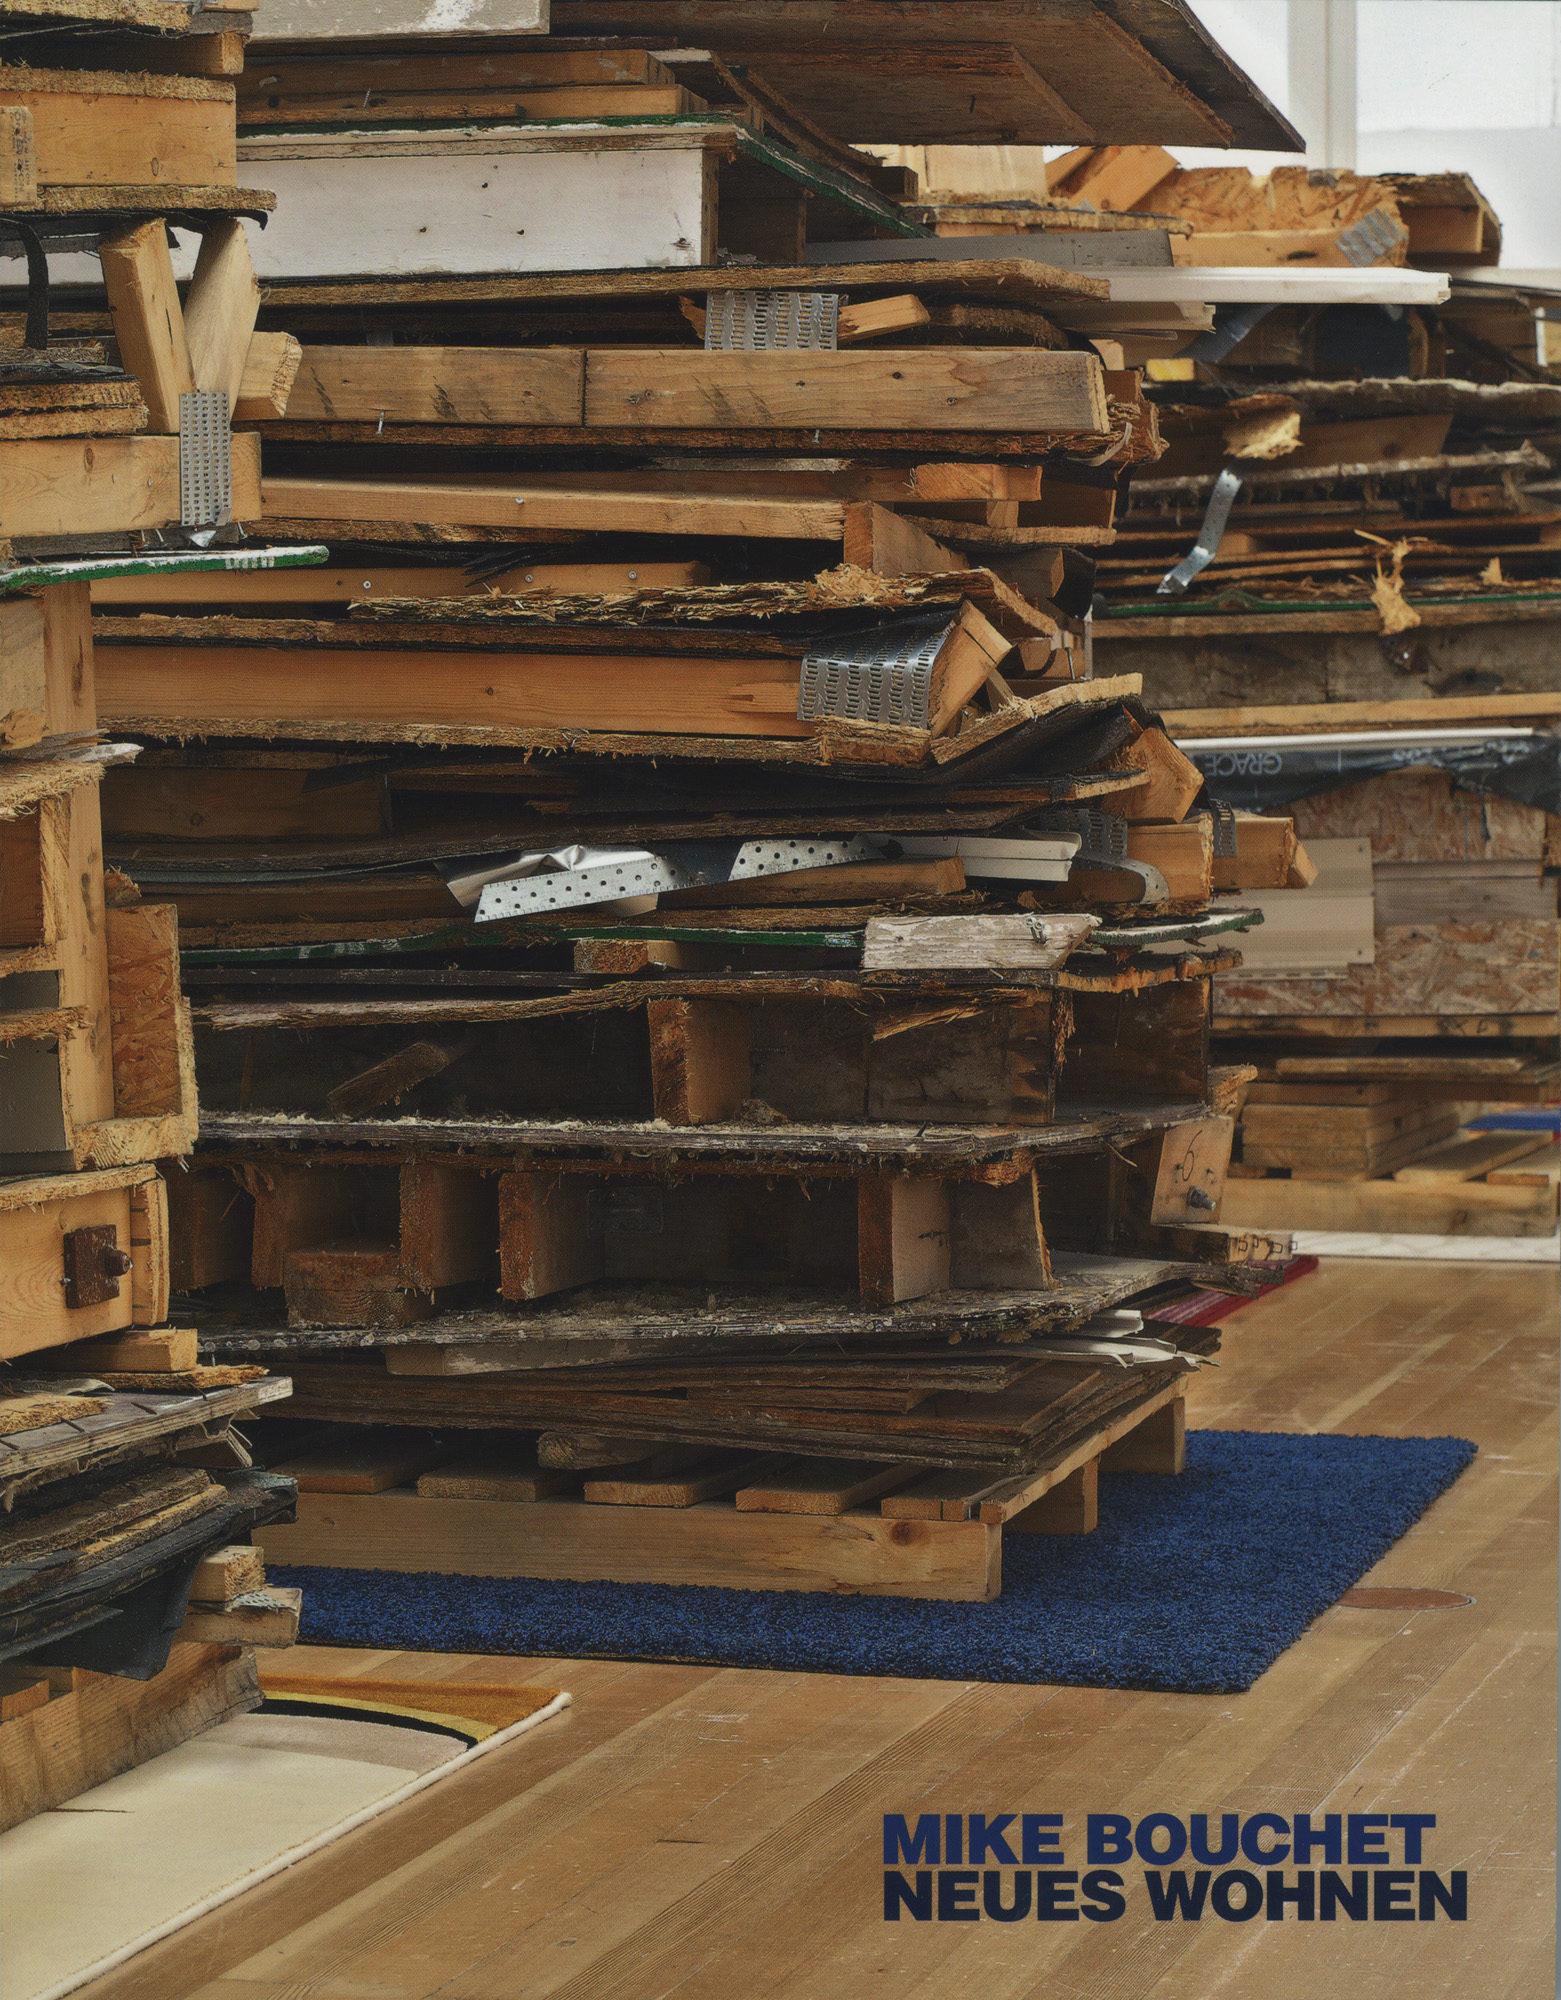 Mike Bouchet / Neues Wohnen - Galerie Georges-Philippe & Nathalie Vallois